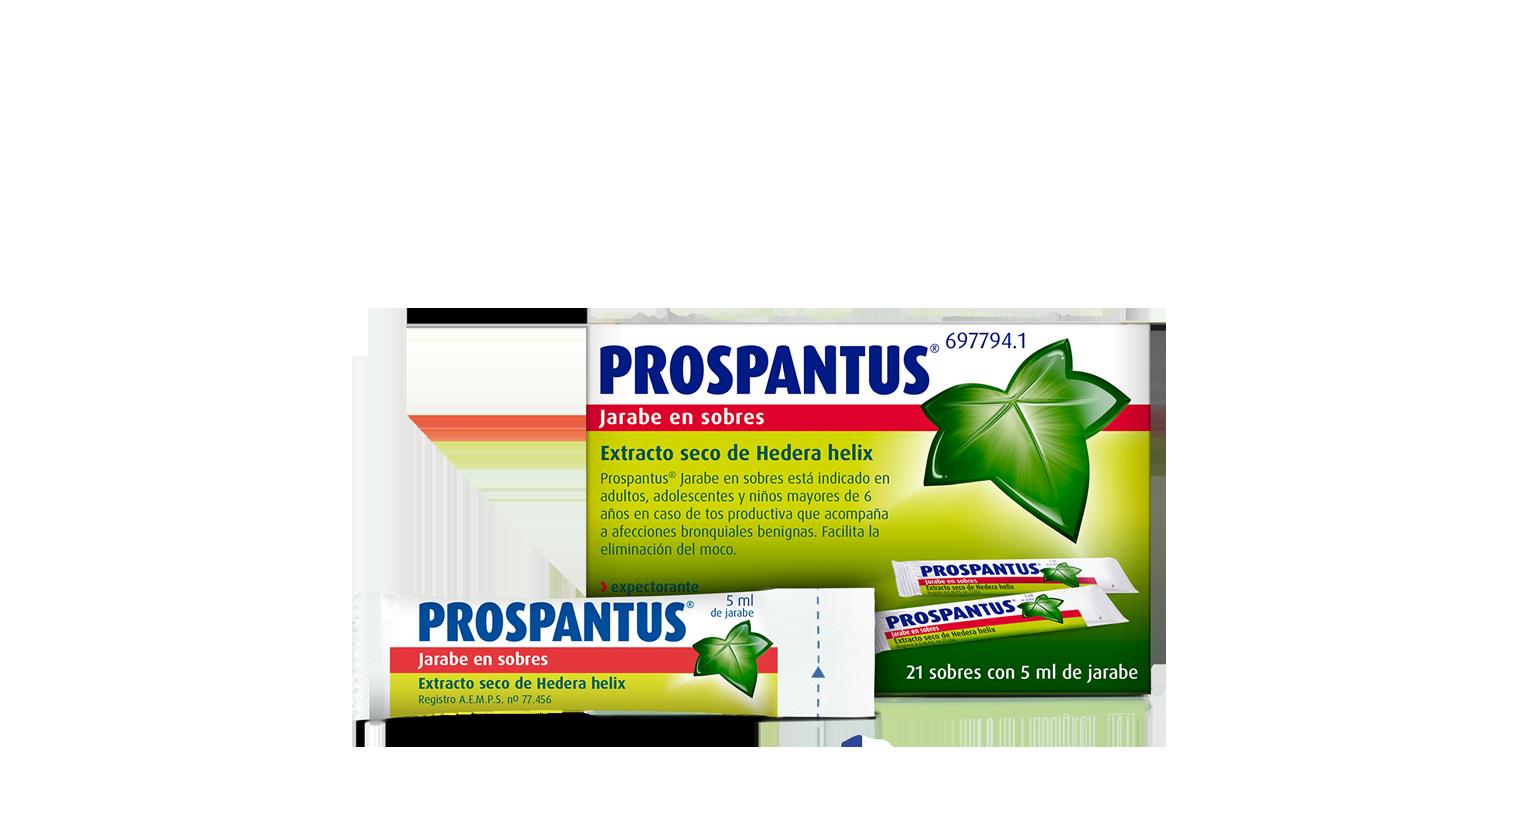 Sobres para tos productiva Prospantus